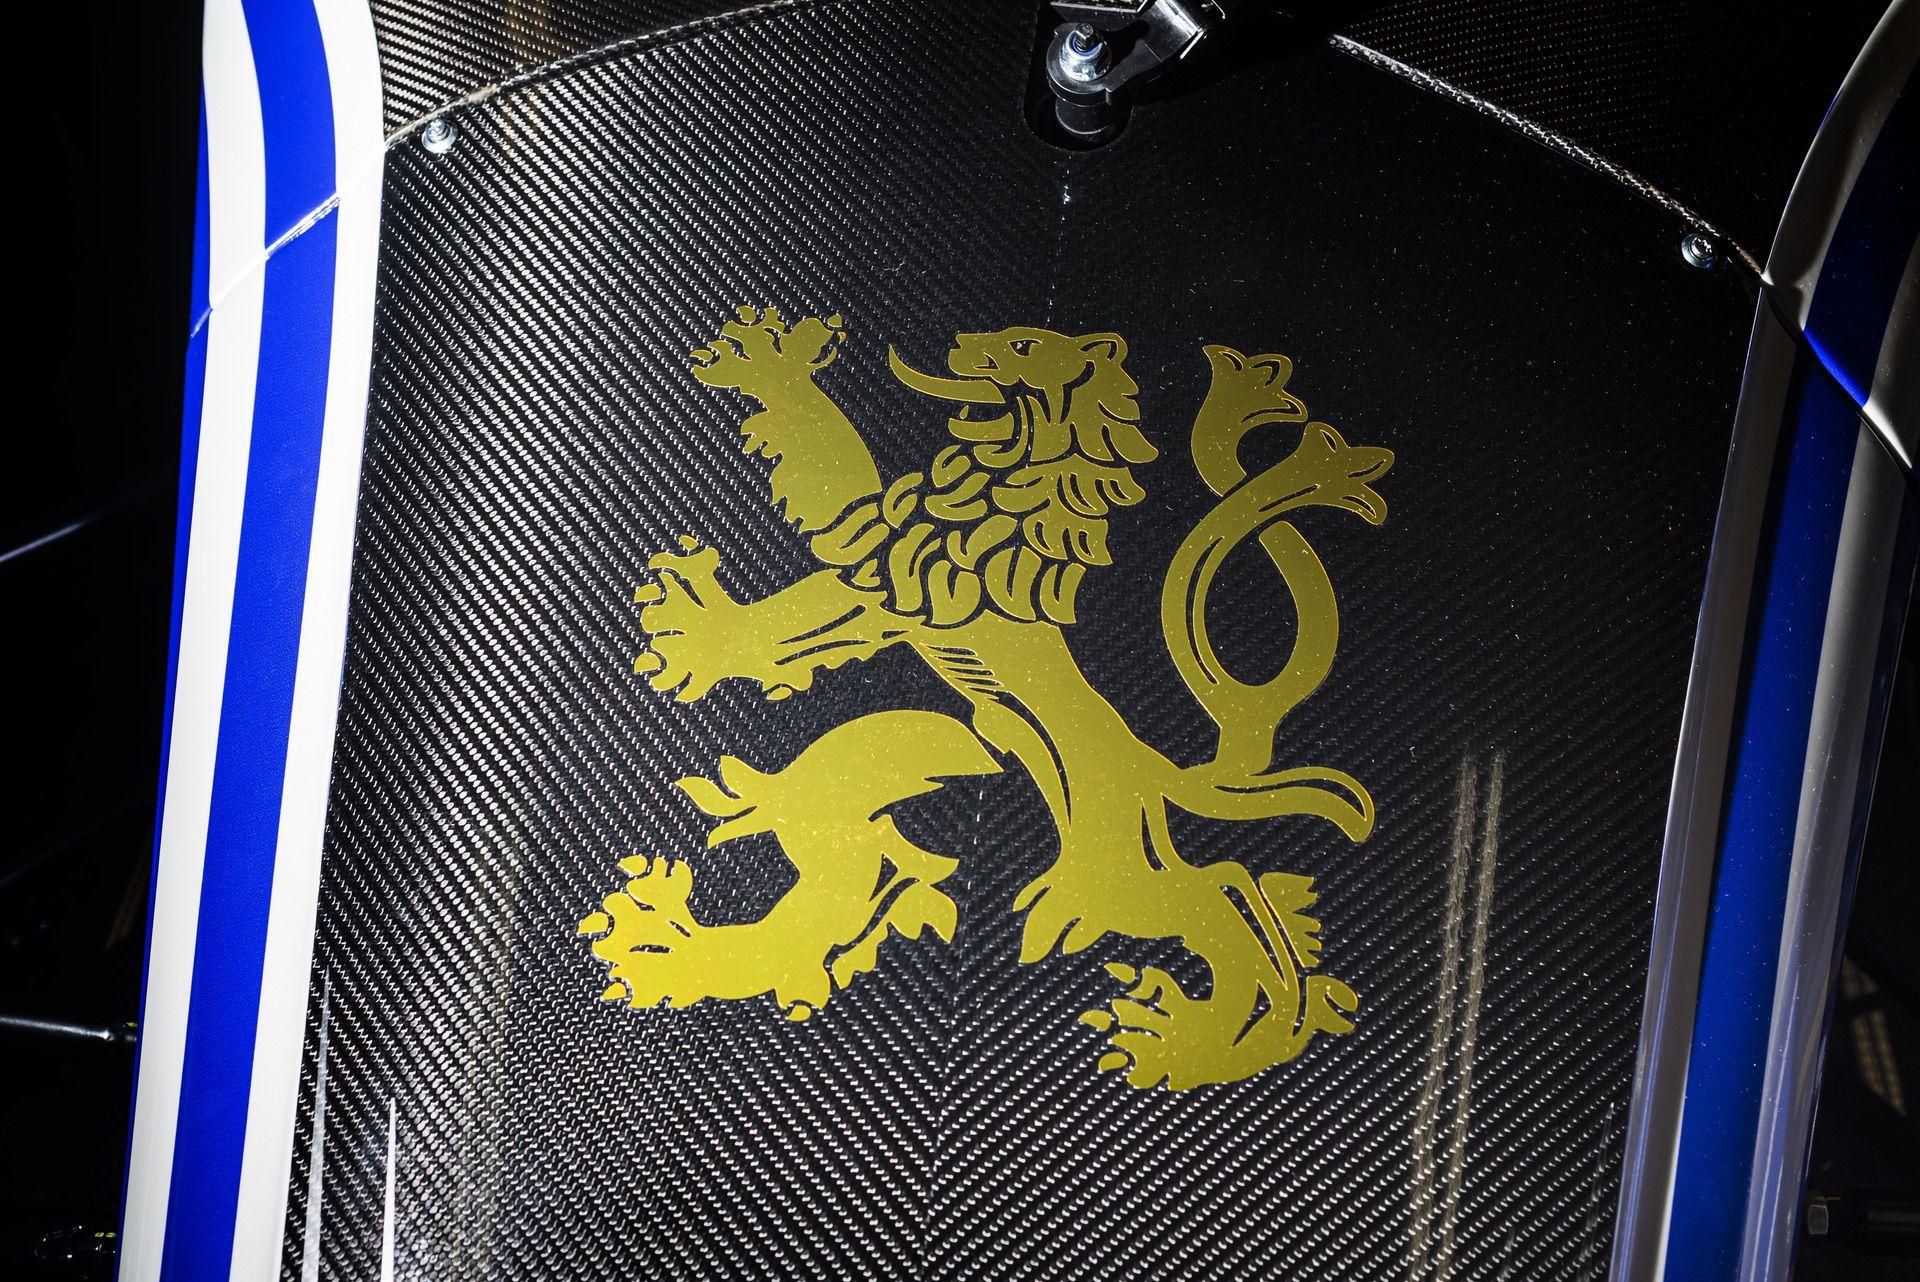 Praga_R1_Frank_Stephenson_racing_livery-0010